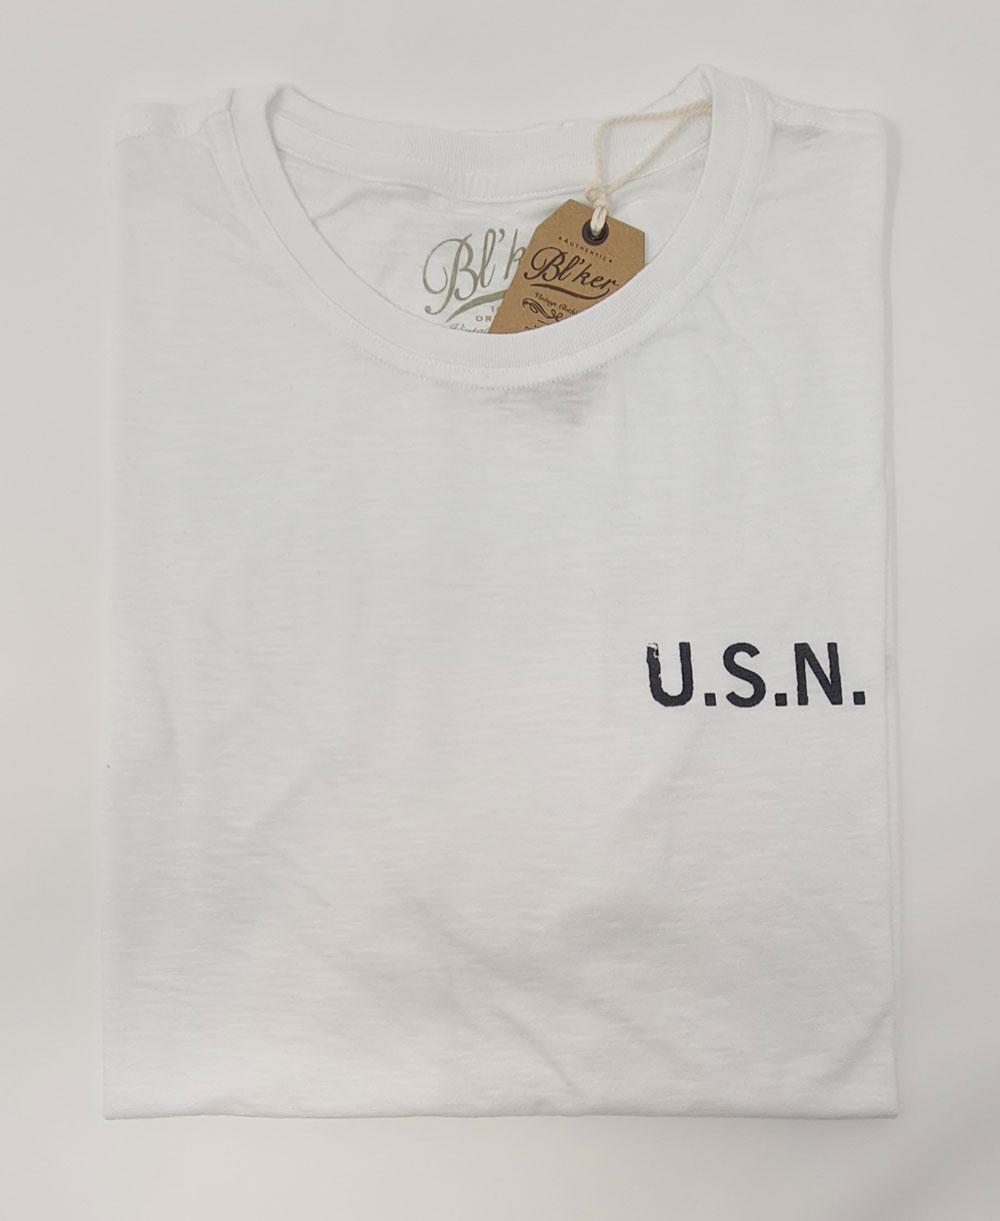 USN 2021 T-Shirt Manica Corta Uomo White